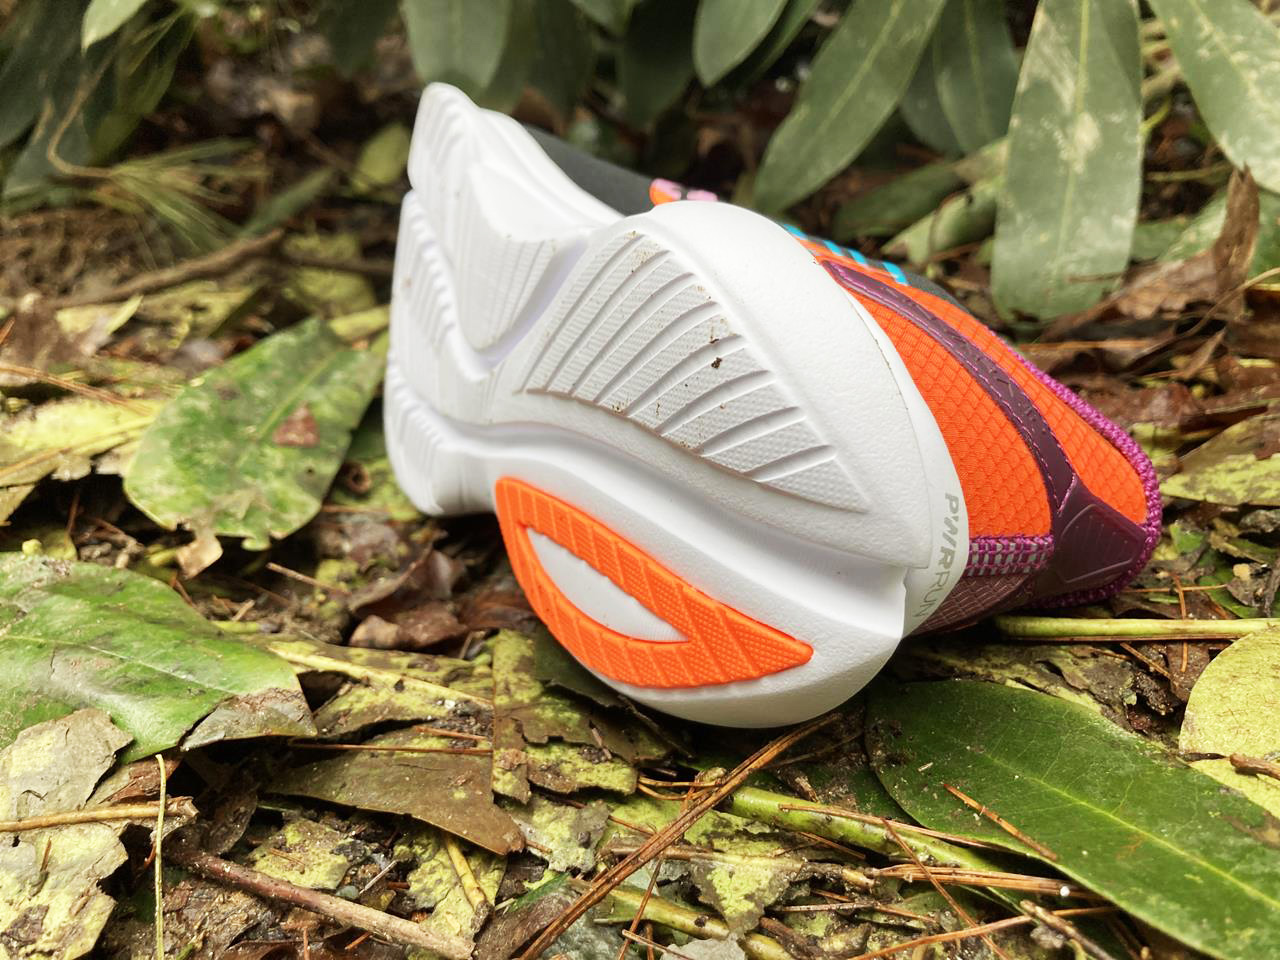 Saucony Kinvara 12 - Sole and Heel